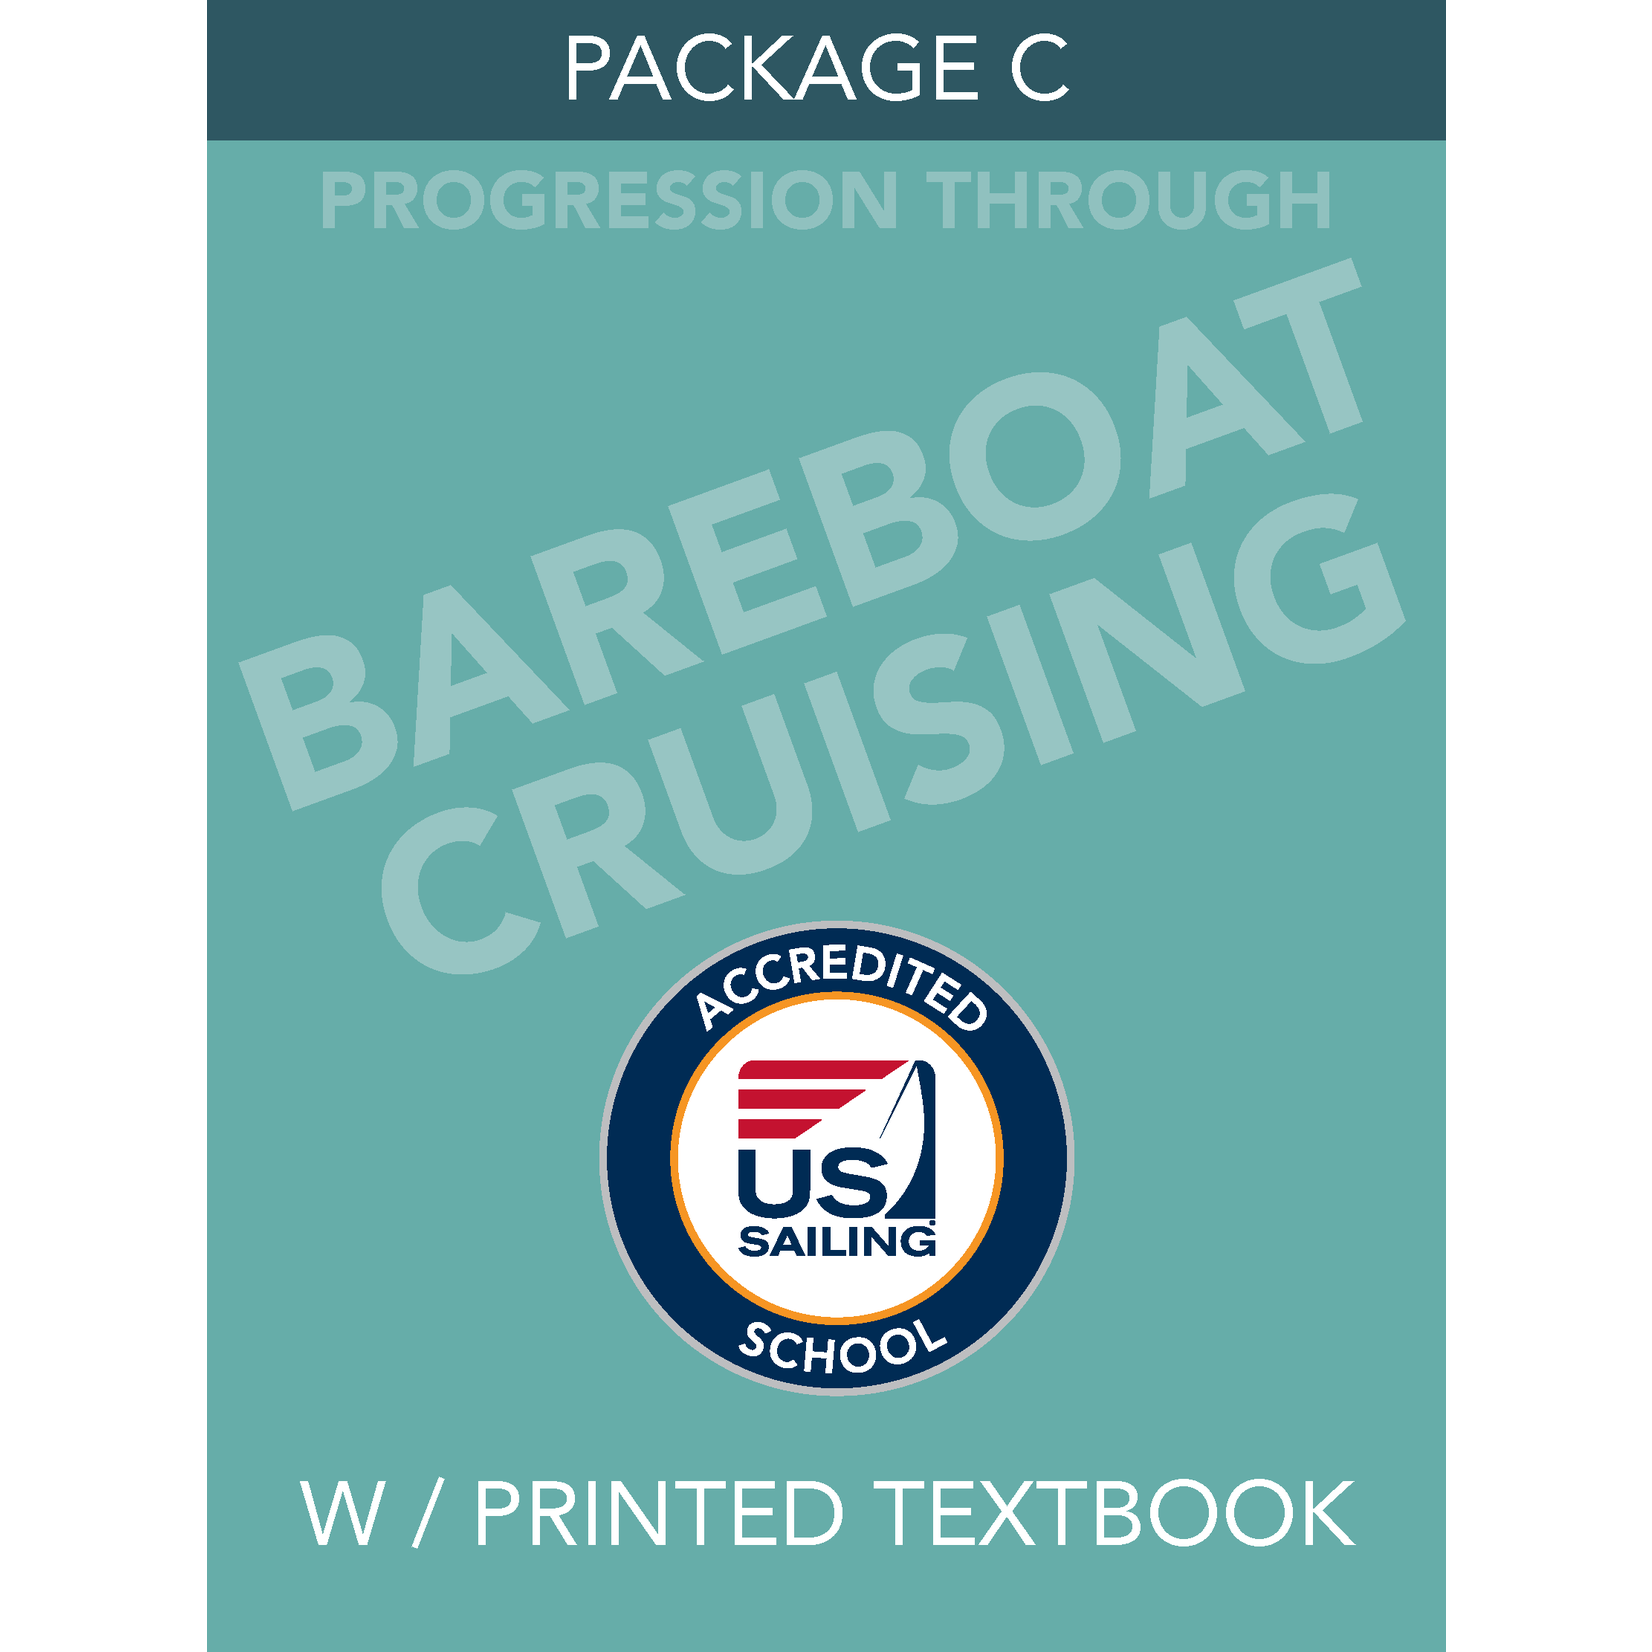 Package C- Bareboat Cruising